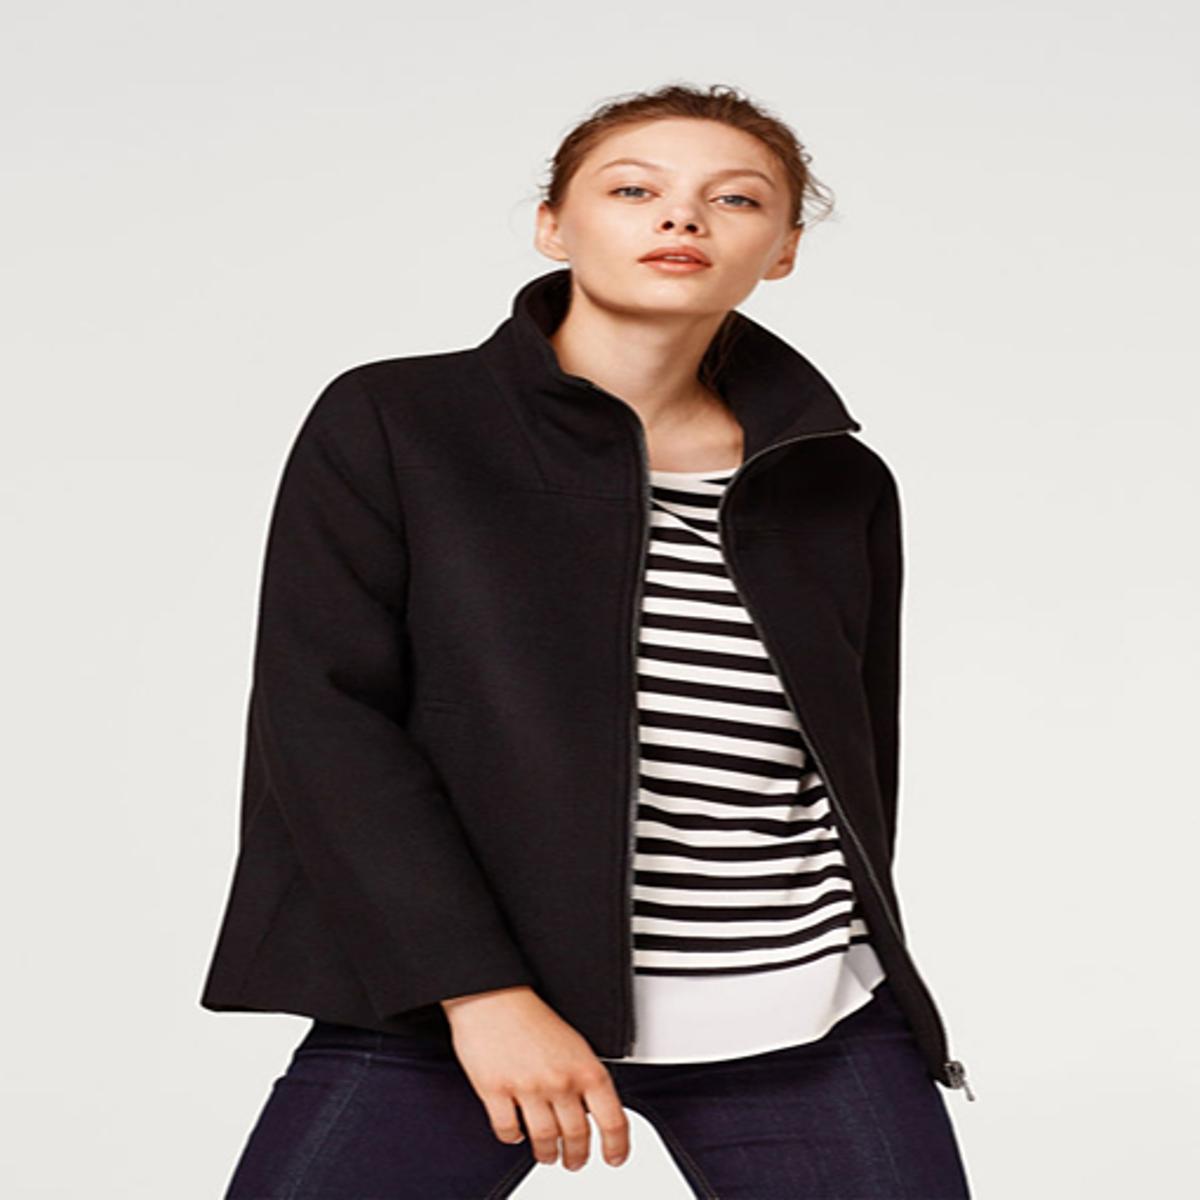 Abrigo corto con cremallera y cuello alto